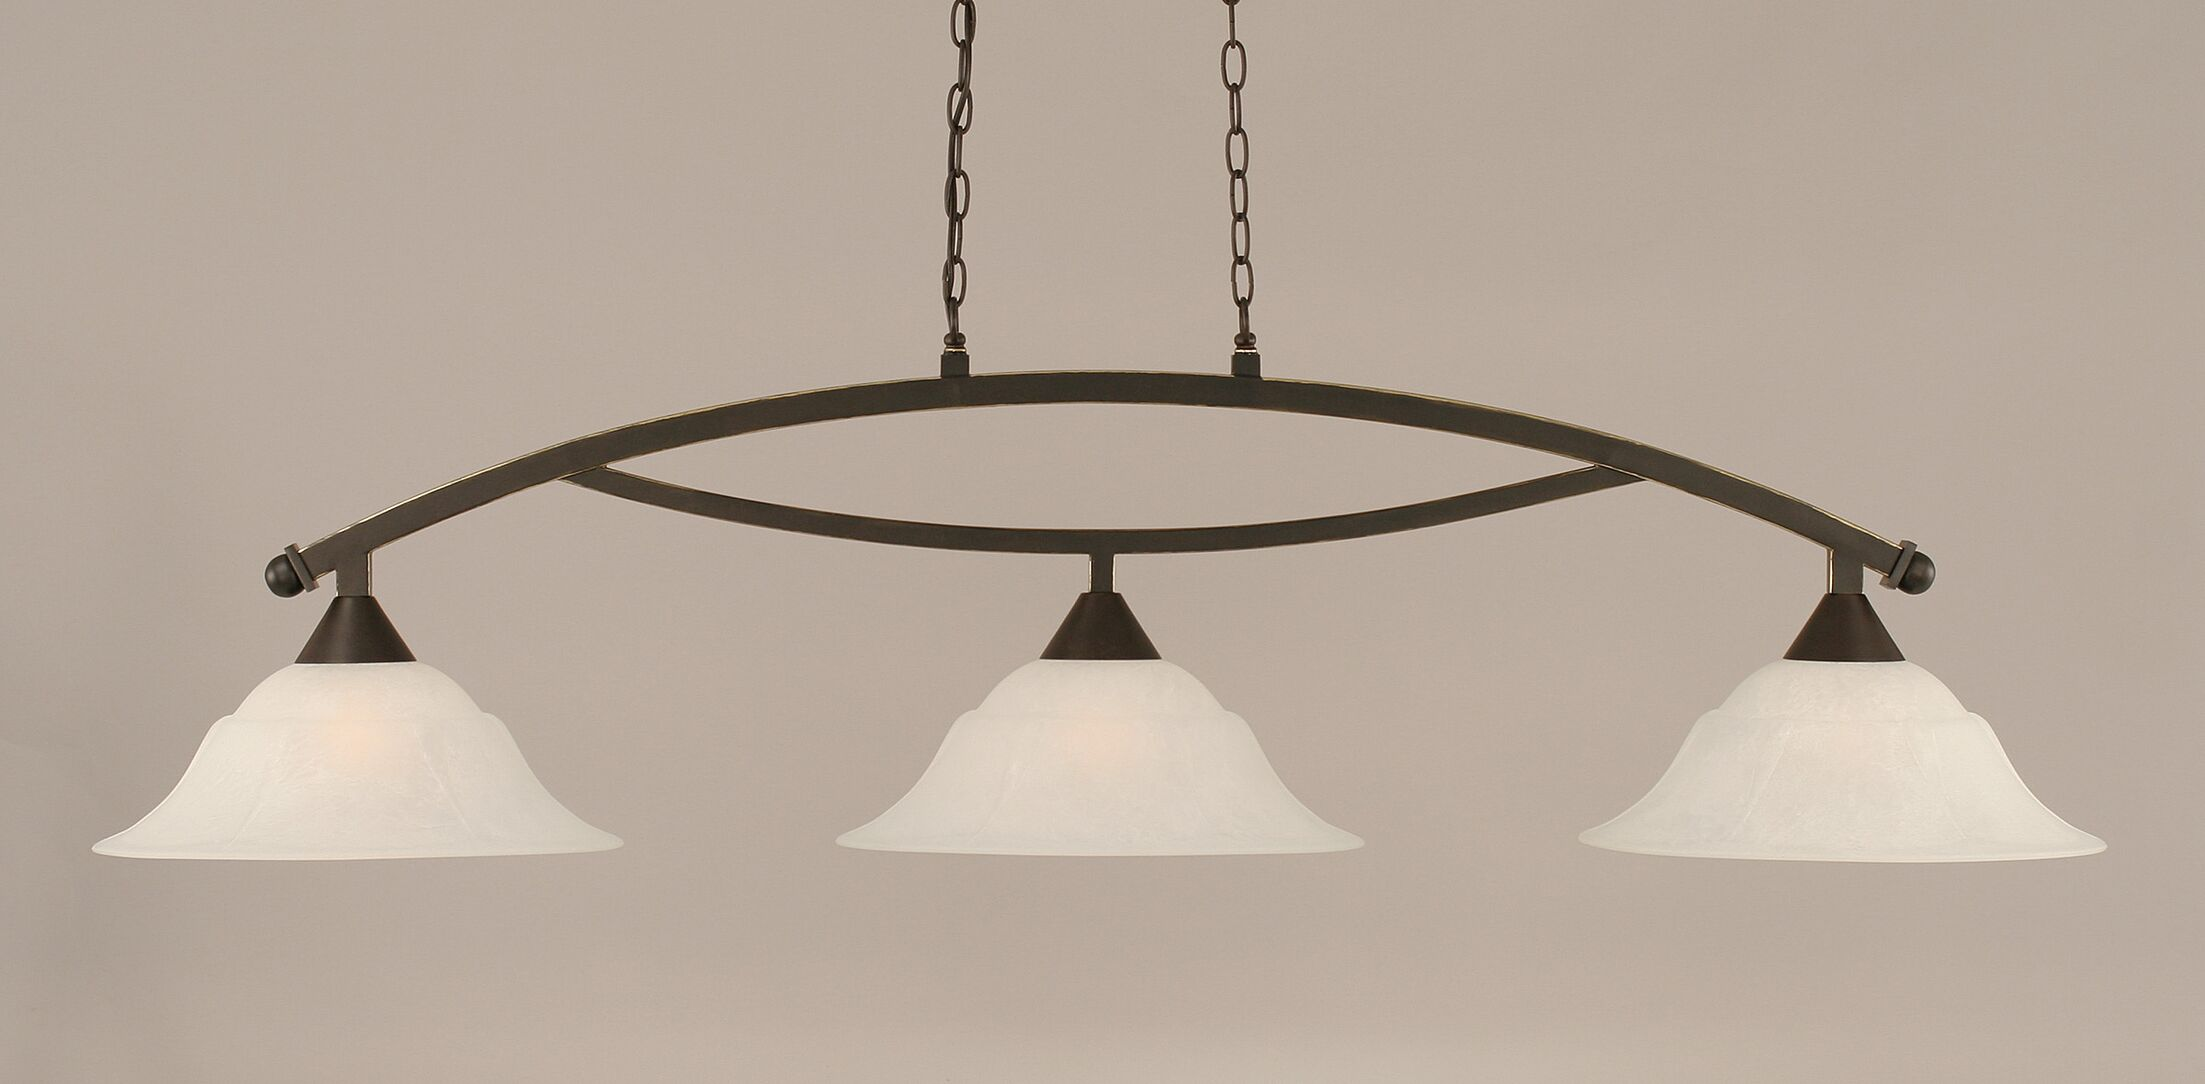 Blankenship 3-Light Kitchen Island Pendant Shade Color: White, Color: Dark Granite